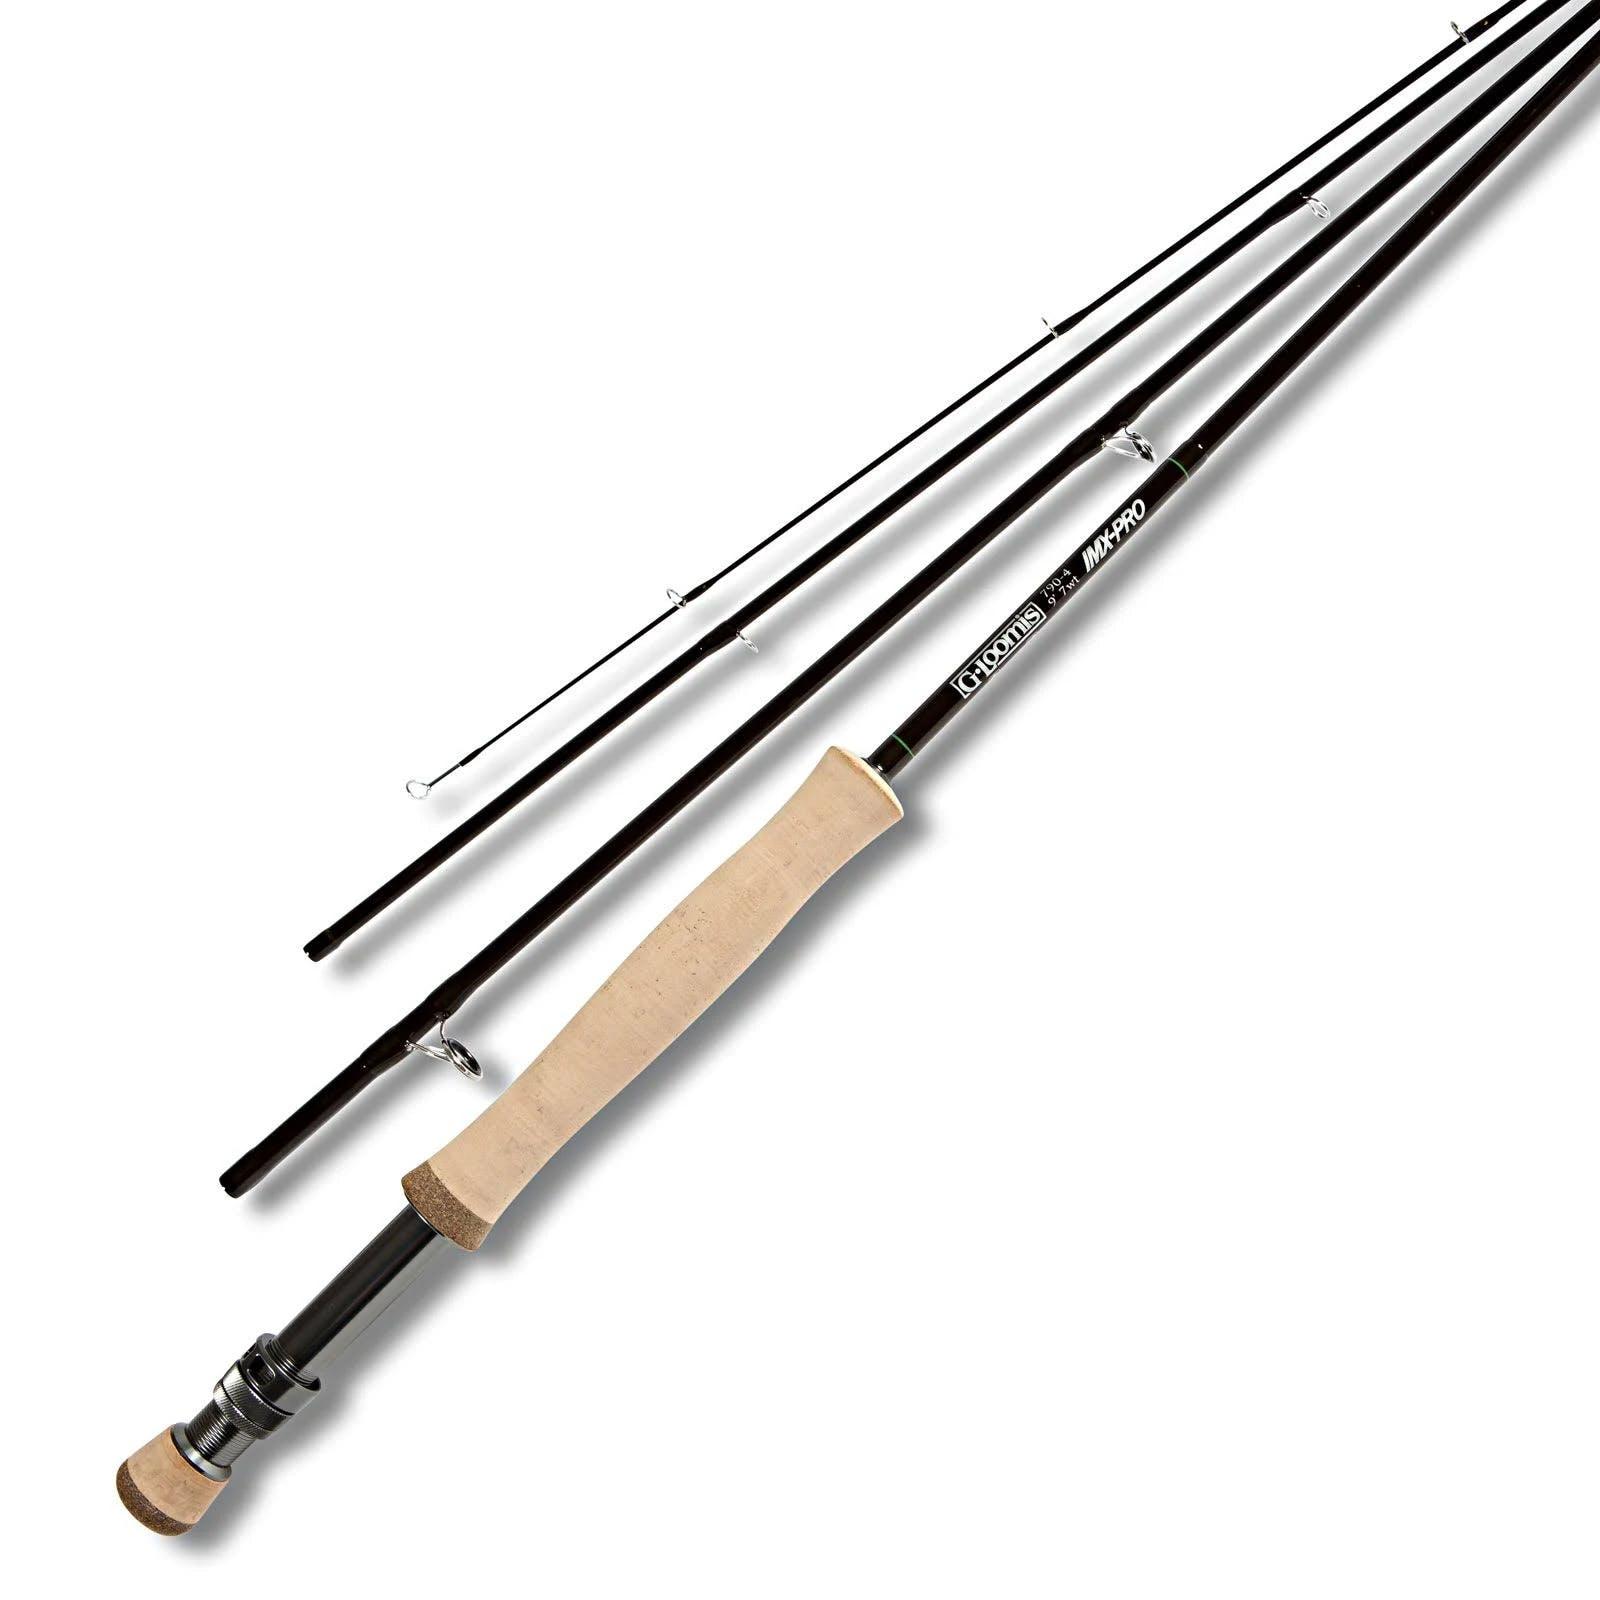 G. Loomis IMX-PRO 790-4 Fly Rod